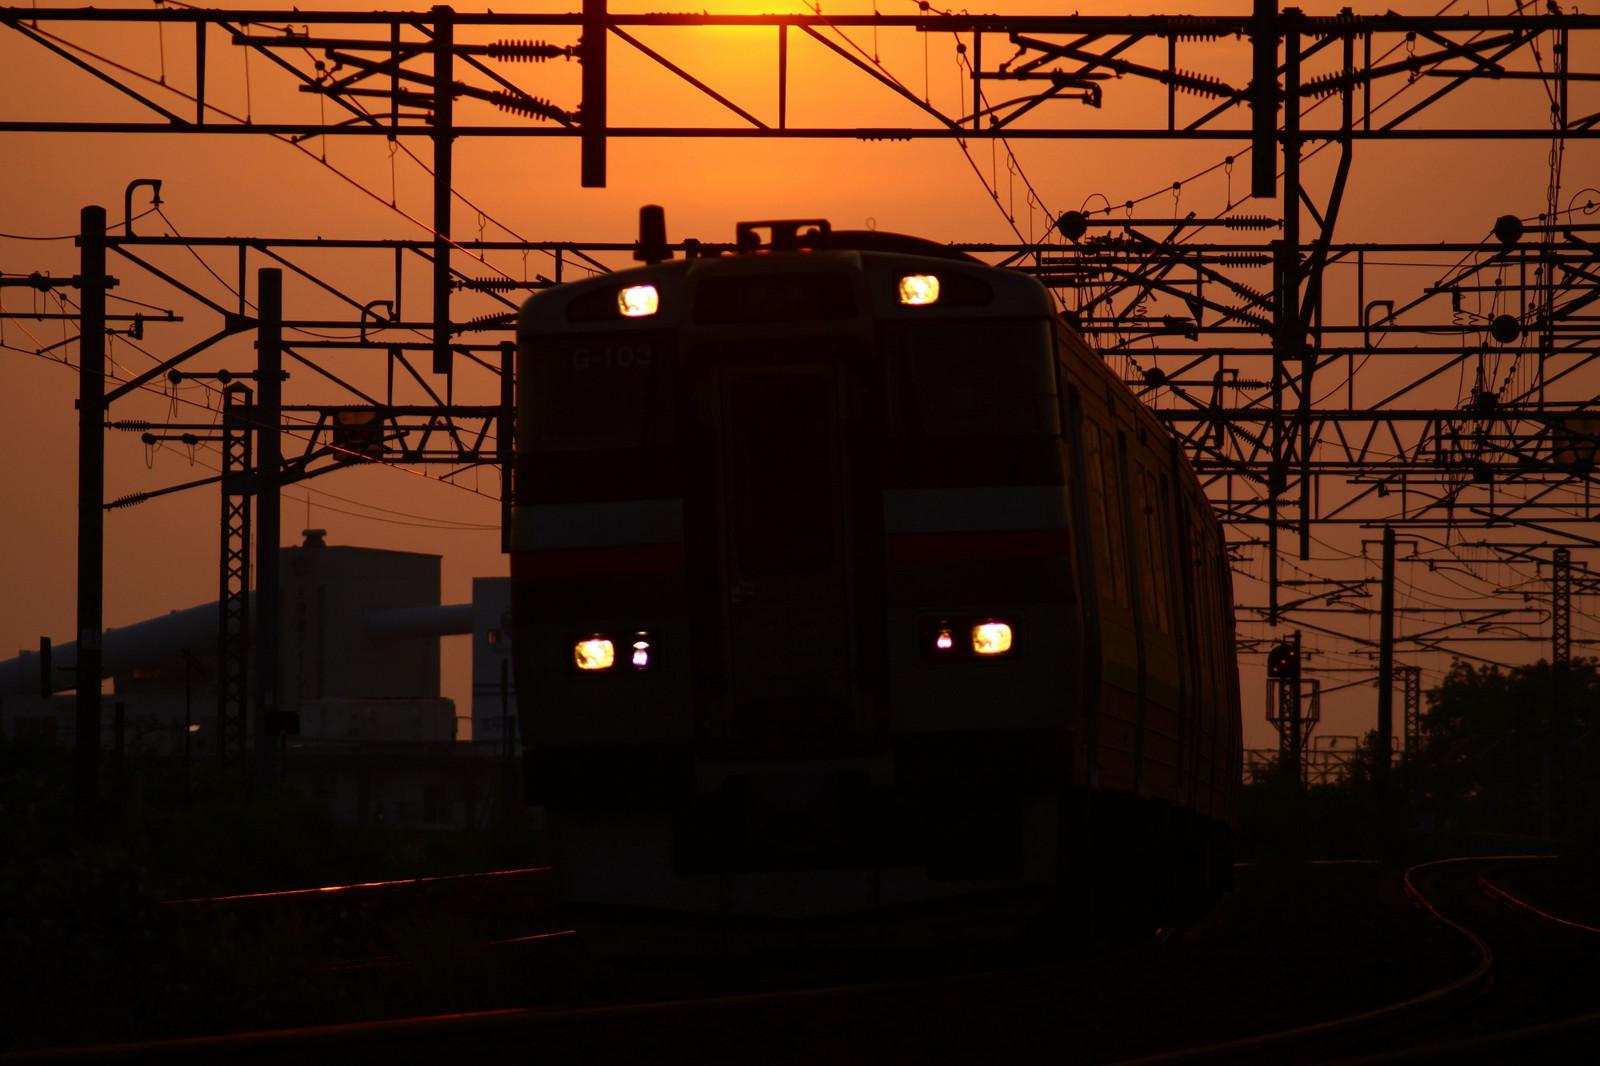 Jr1706200001